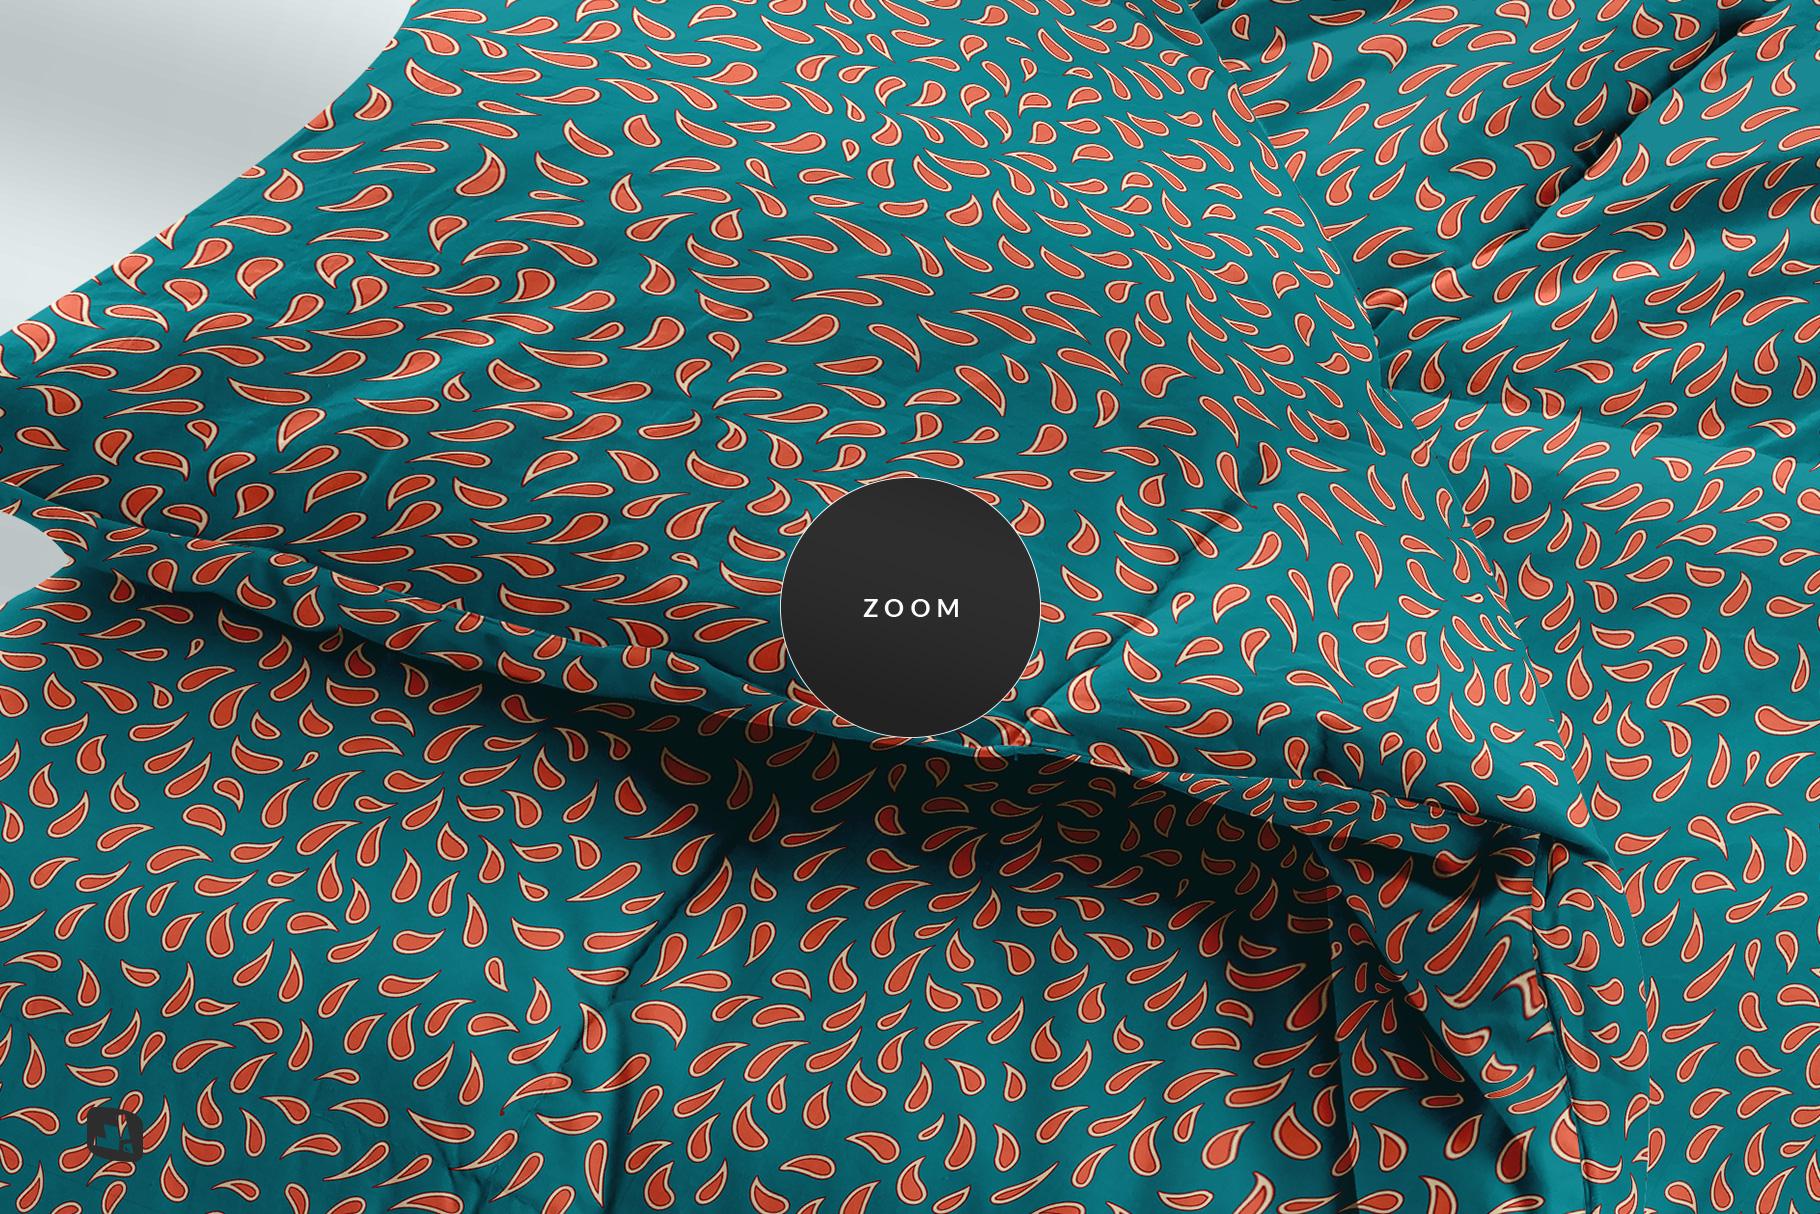 zoomed in image of the folded comforter blanket mockup